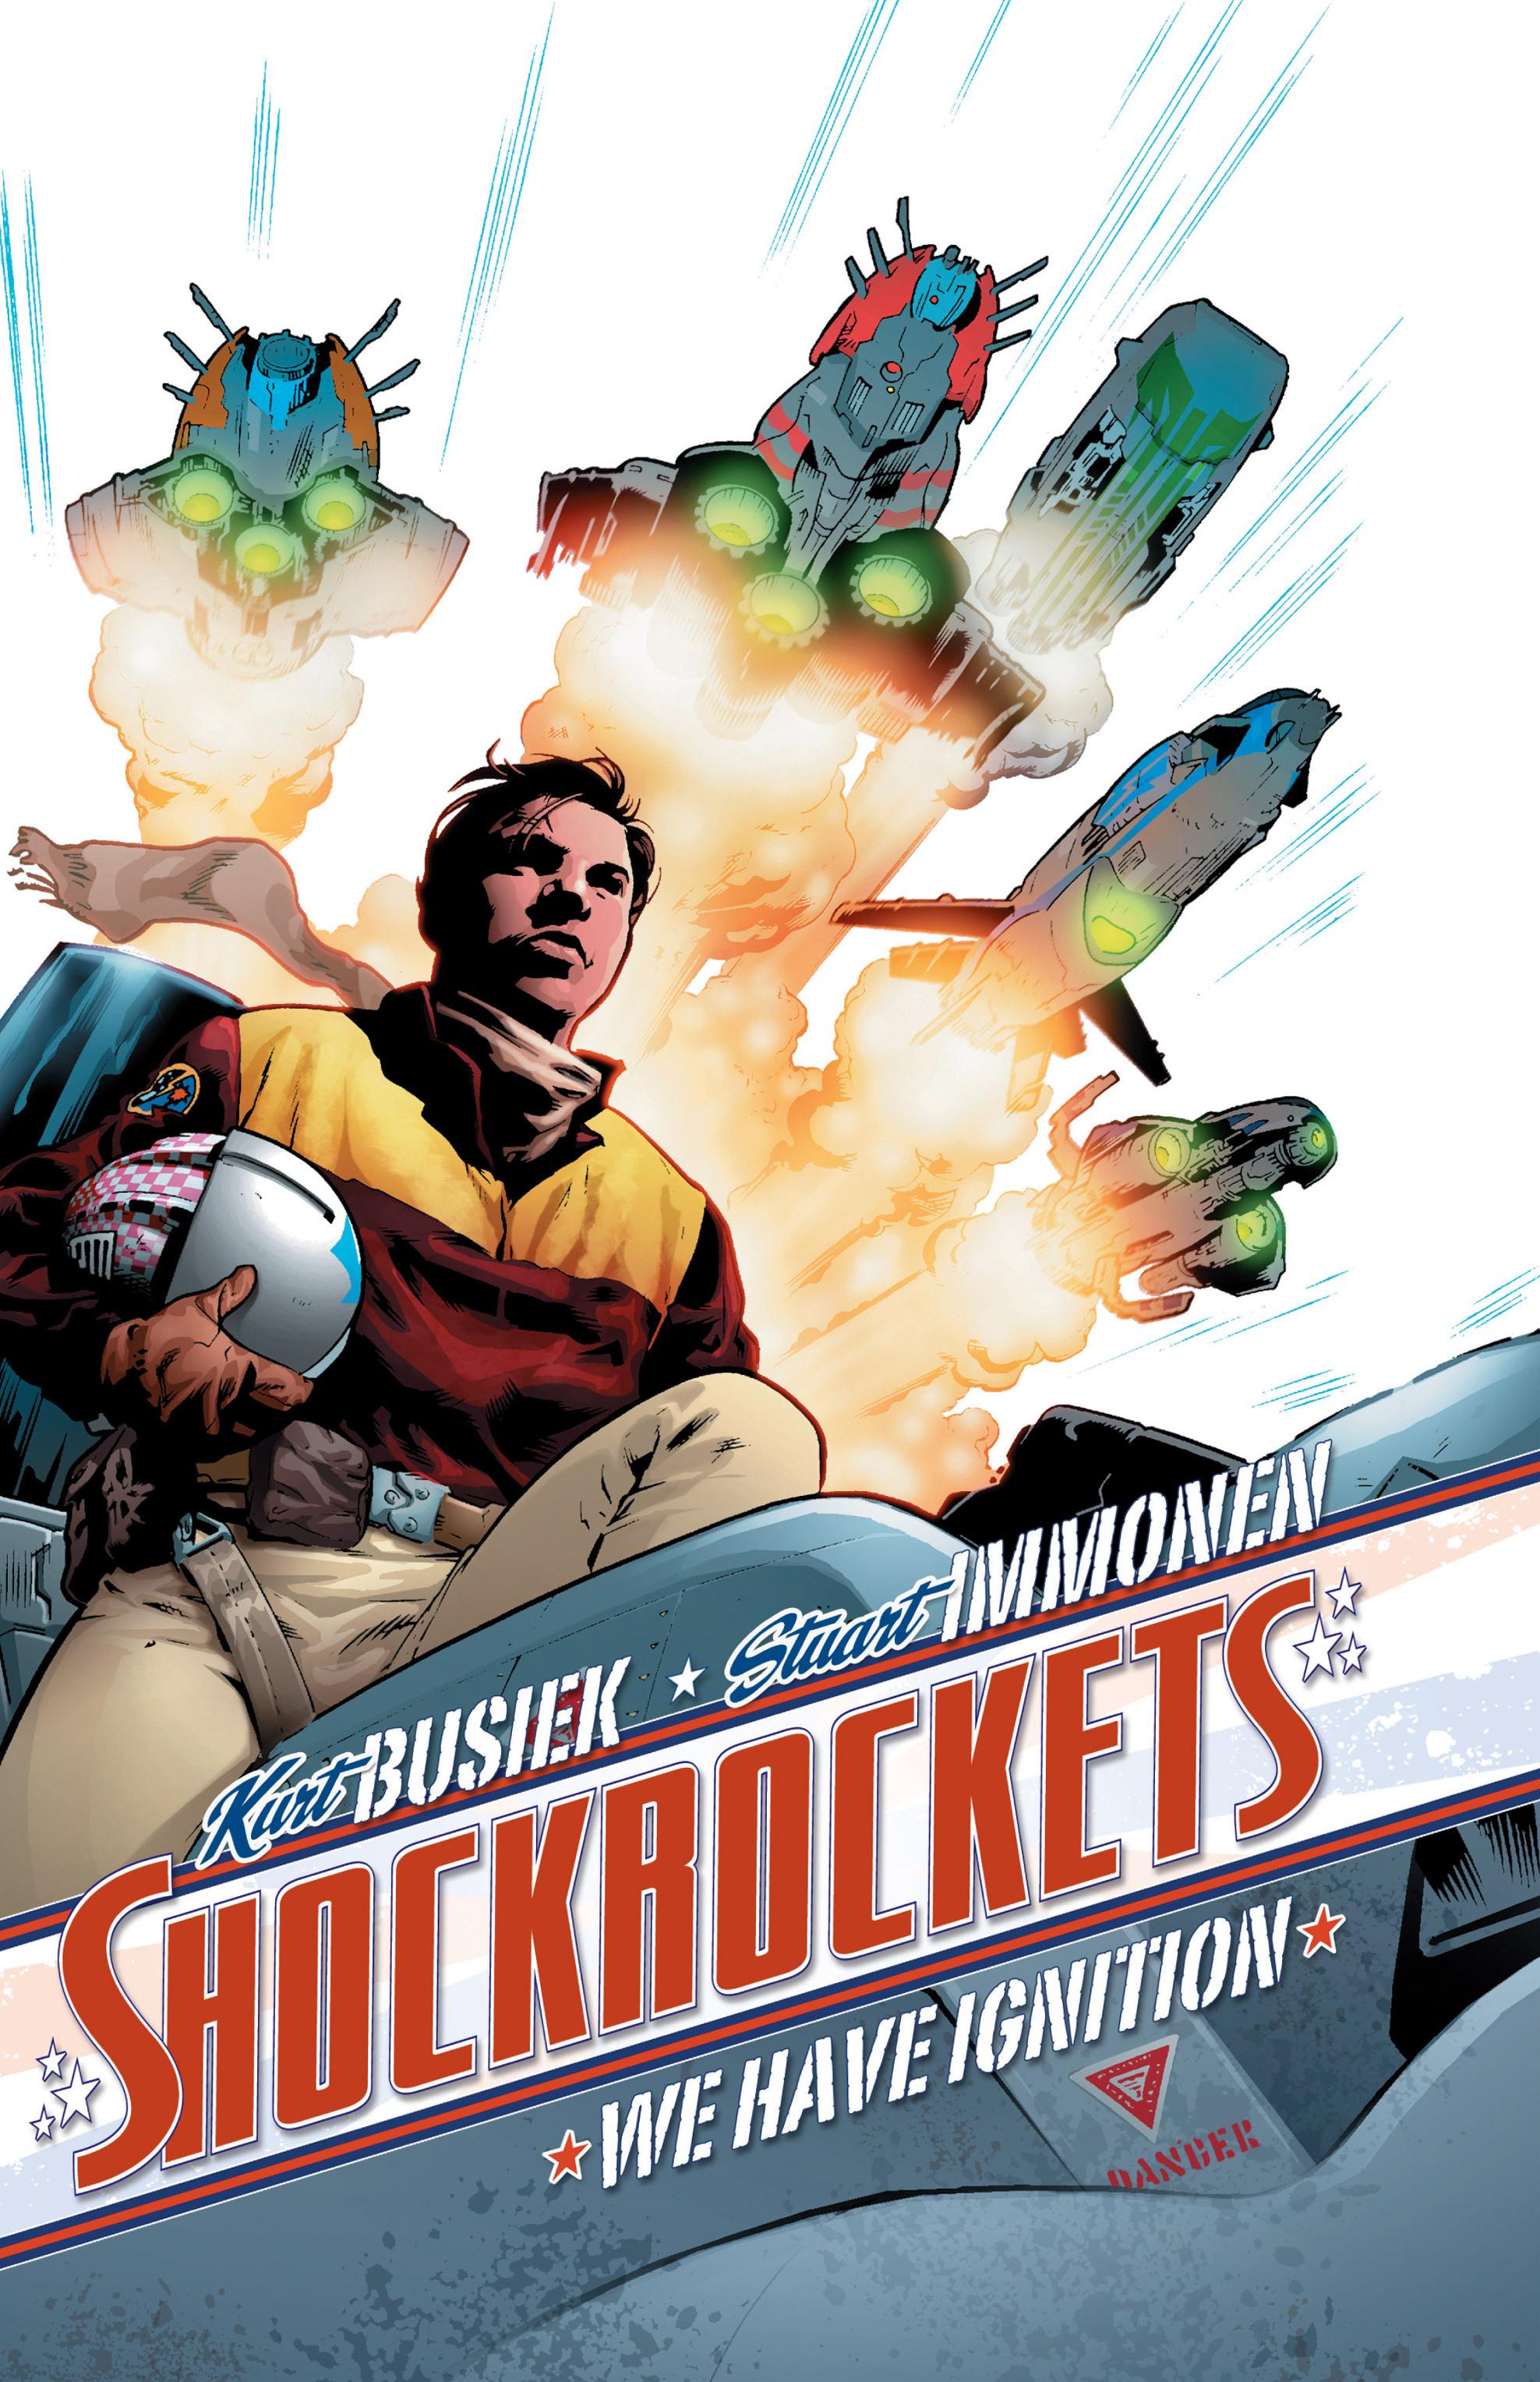 Read online Shockrockets comic -  Issue # TPB - 1